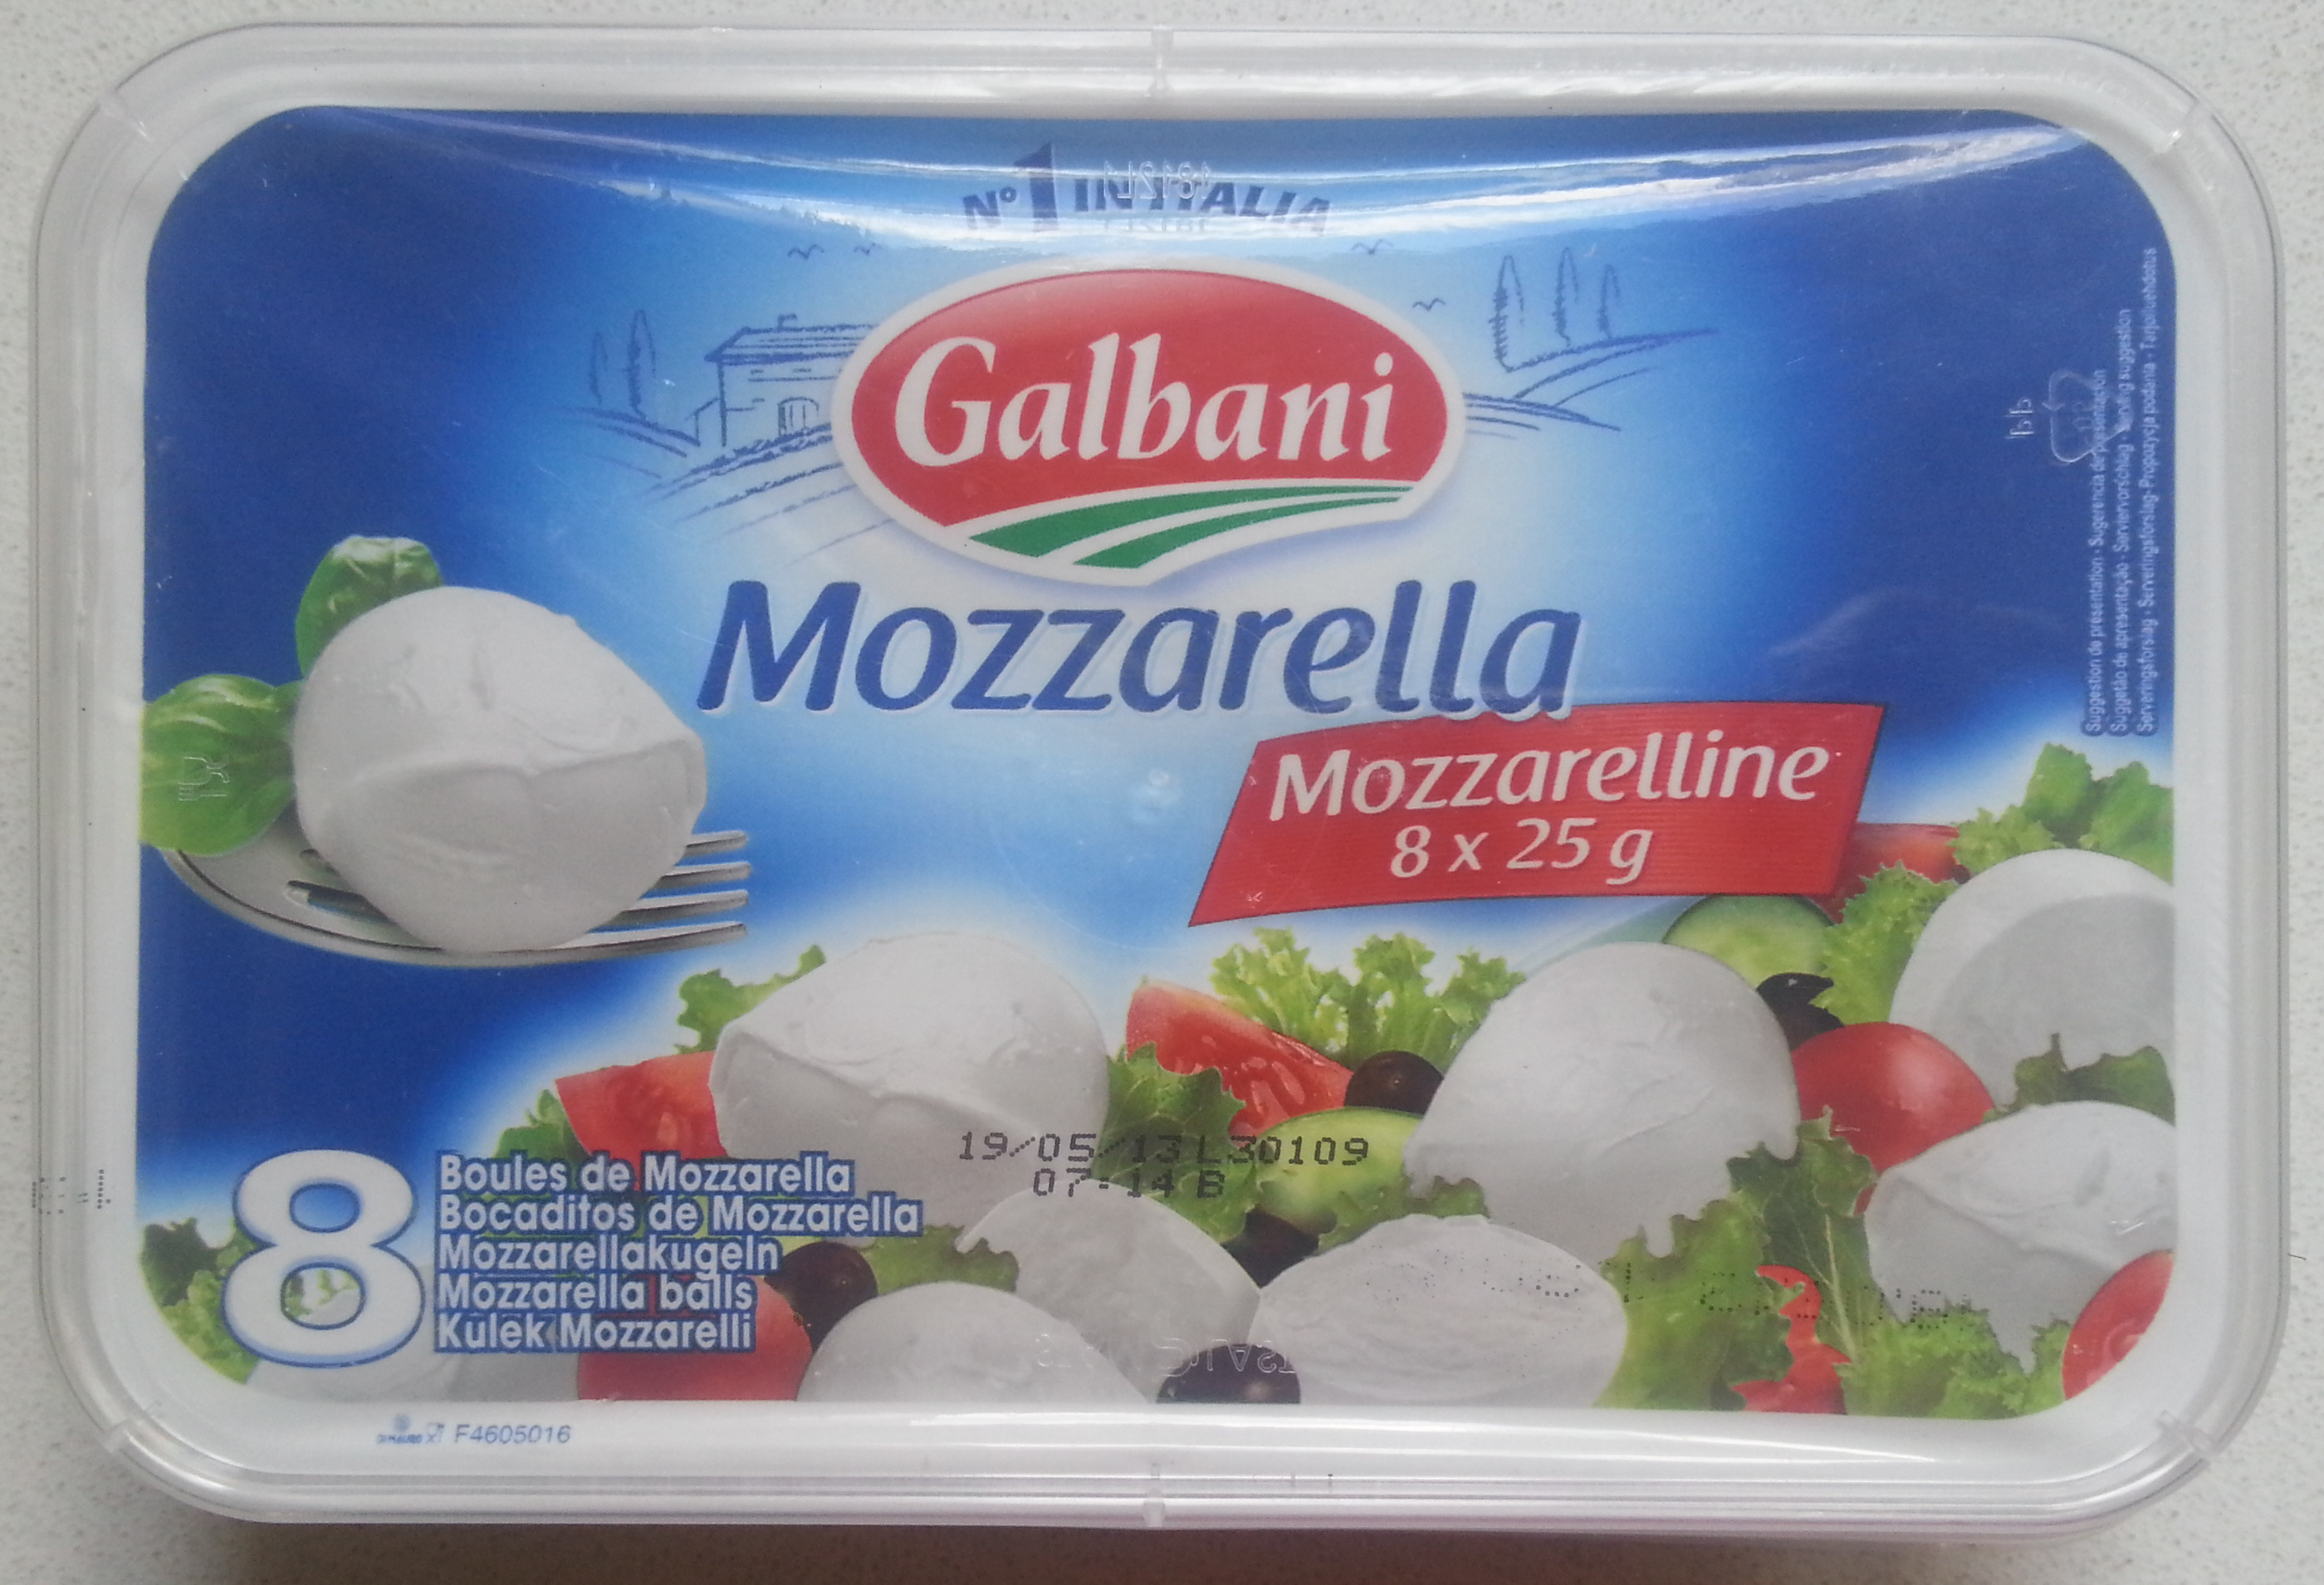 Mozzarella - Mozzarelline 8 Boules (17% MG) - Product - fr